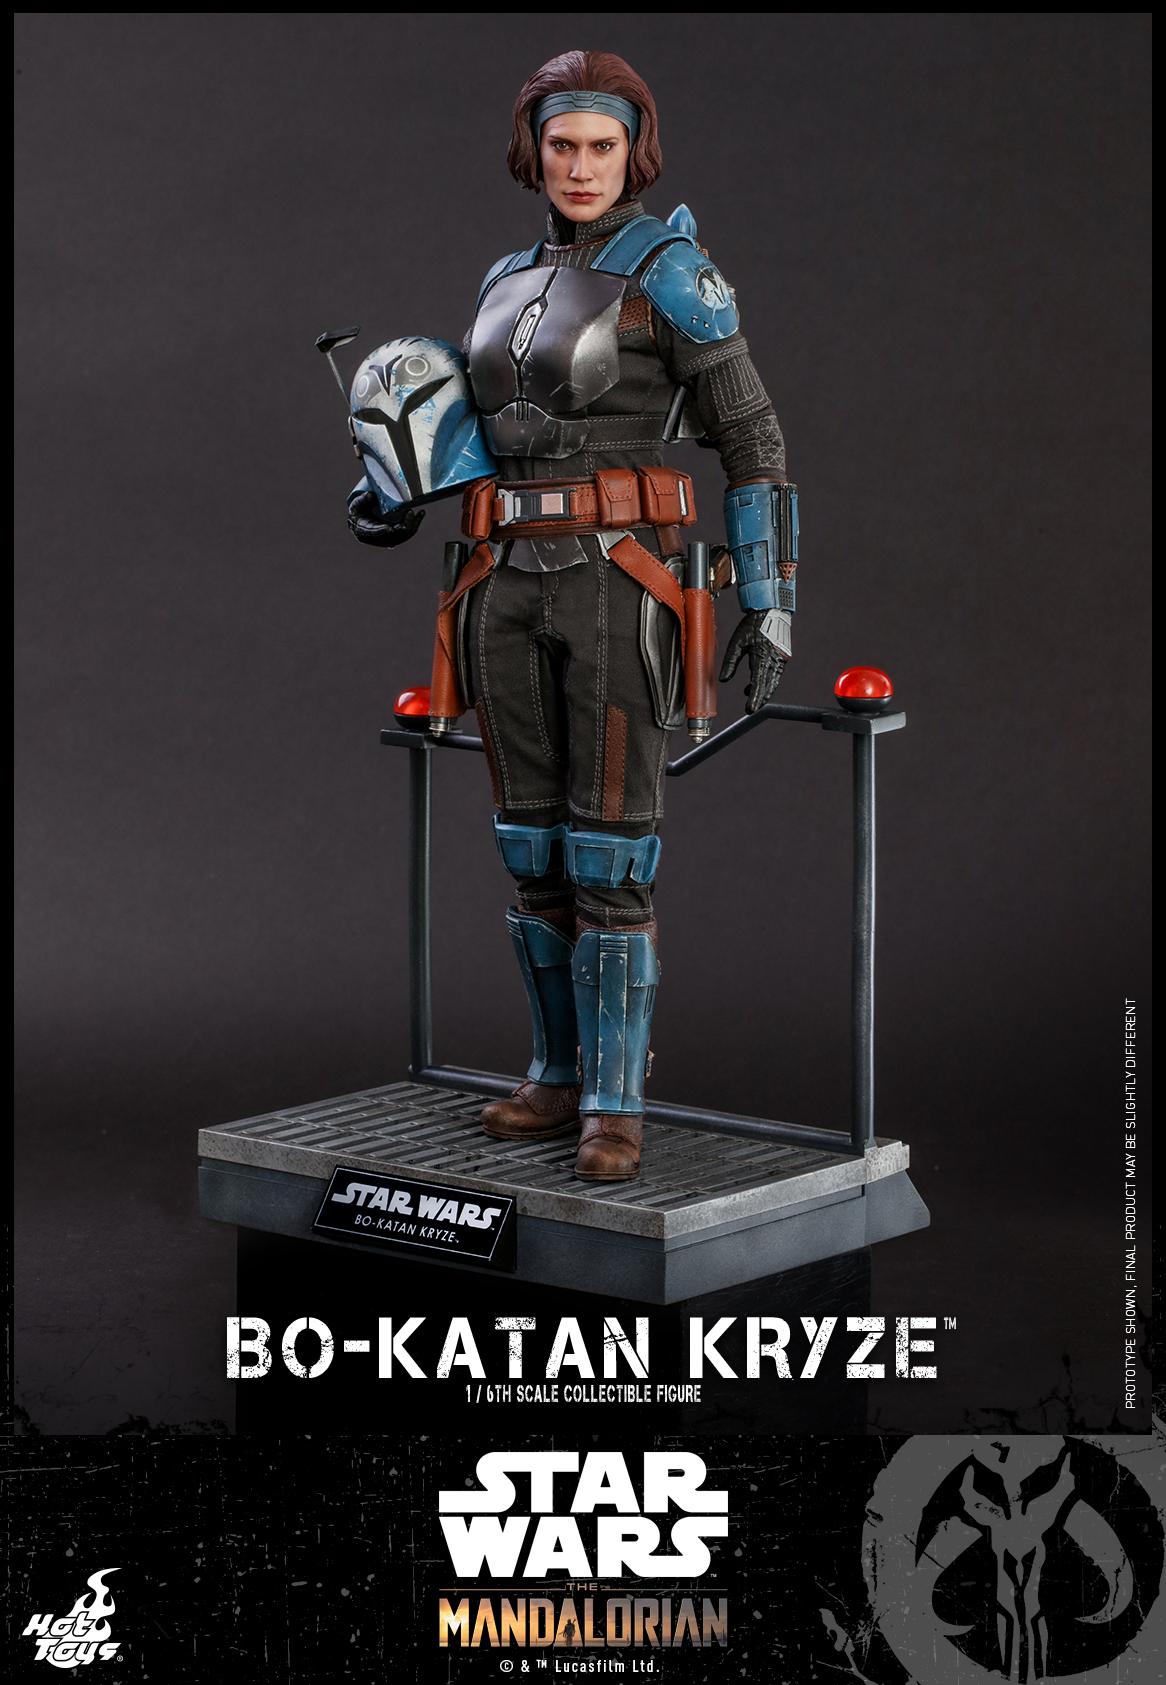 Hot Toys - The Mandalorian (S2) - Bo-Katan Kryze Collectible Figure_PR1